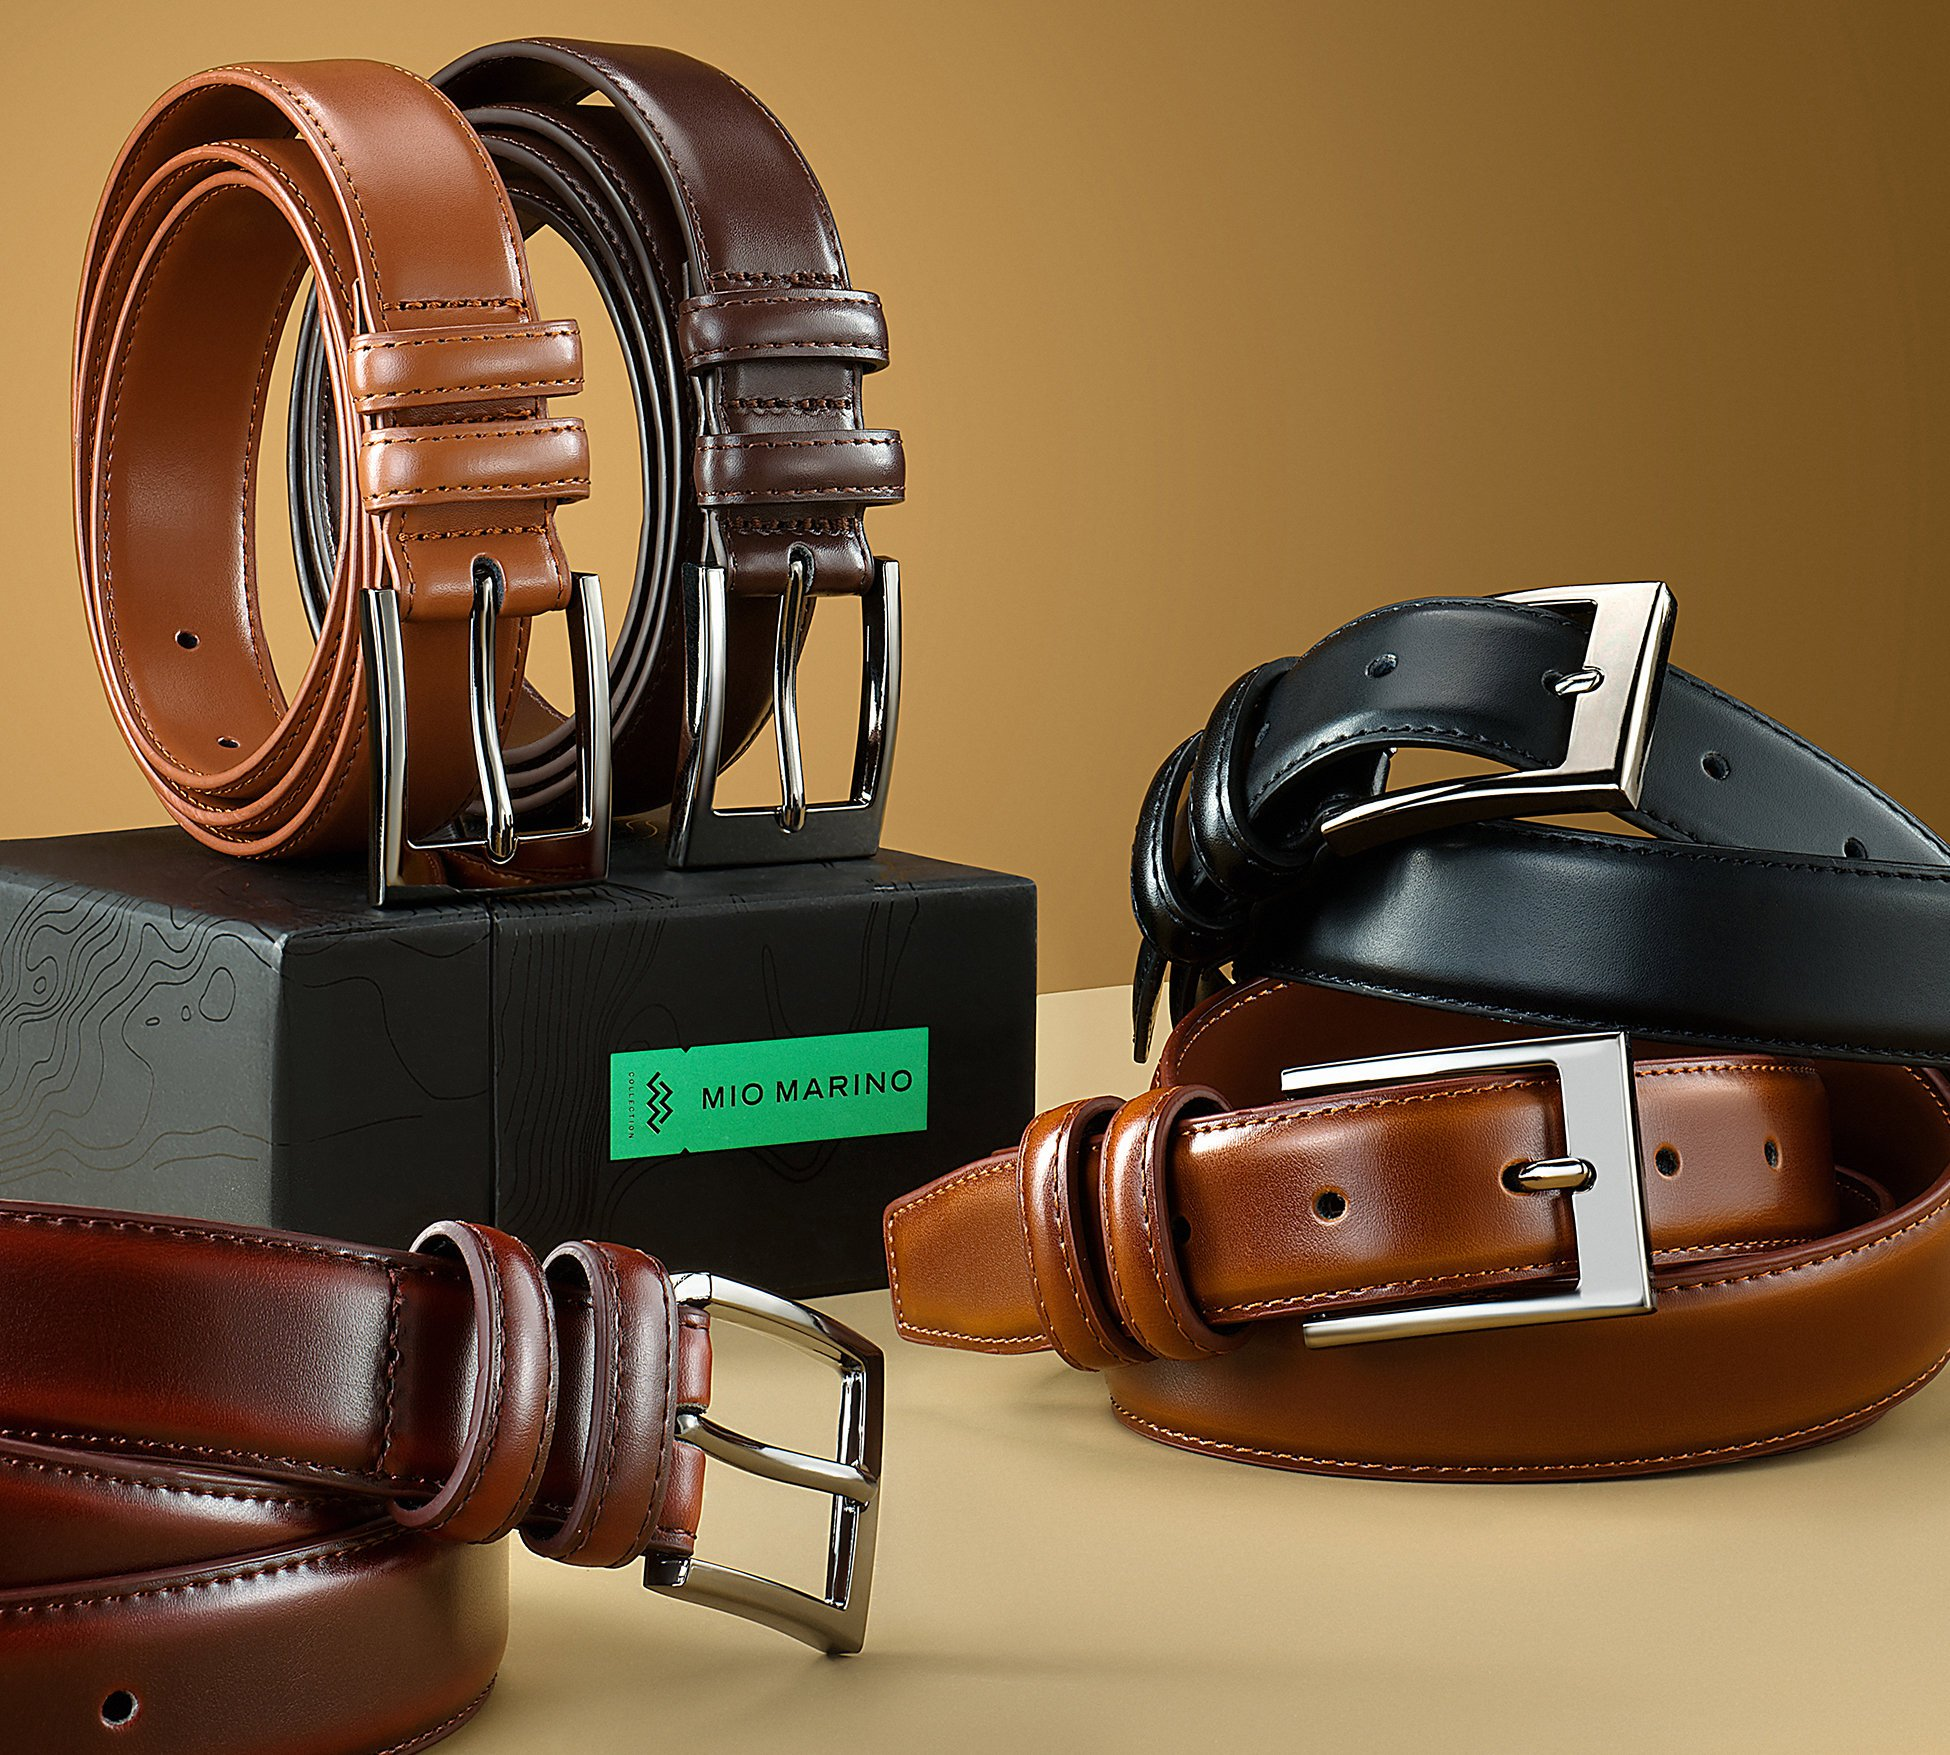 Marino's Men Genuine Leather Dress Belt with Single Prong Buckle - Black - 36 by Marino Avenue (Image #3)